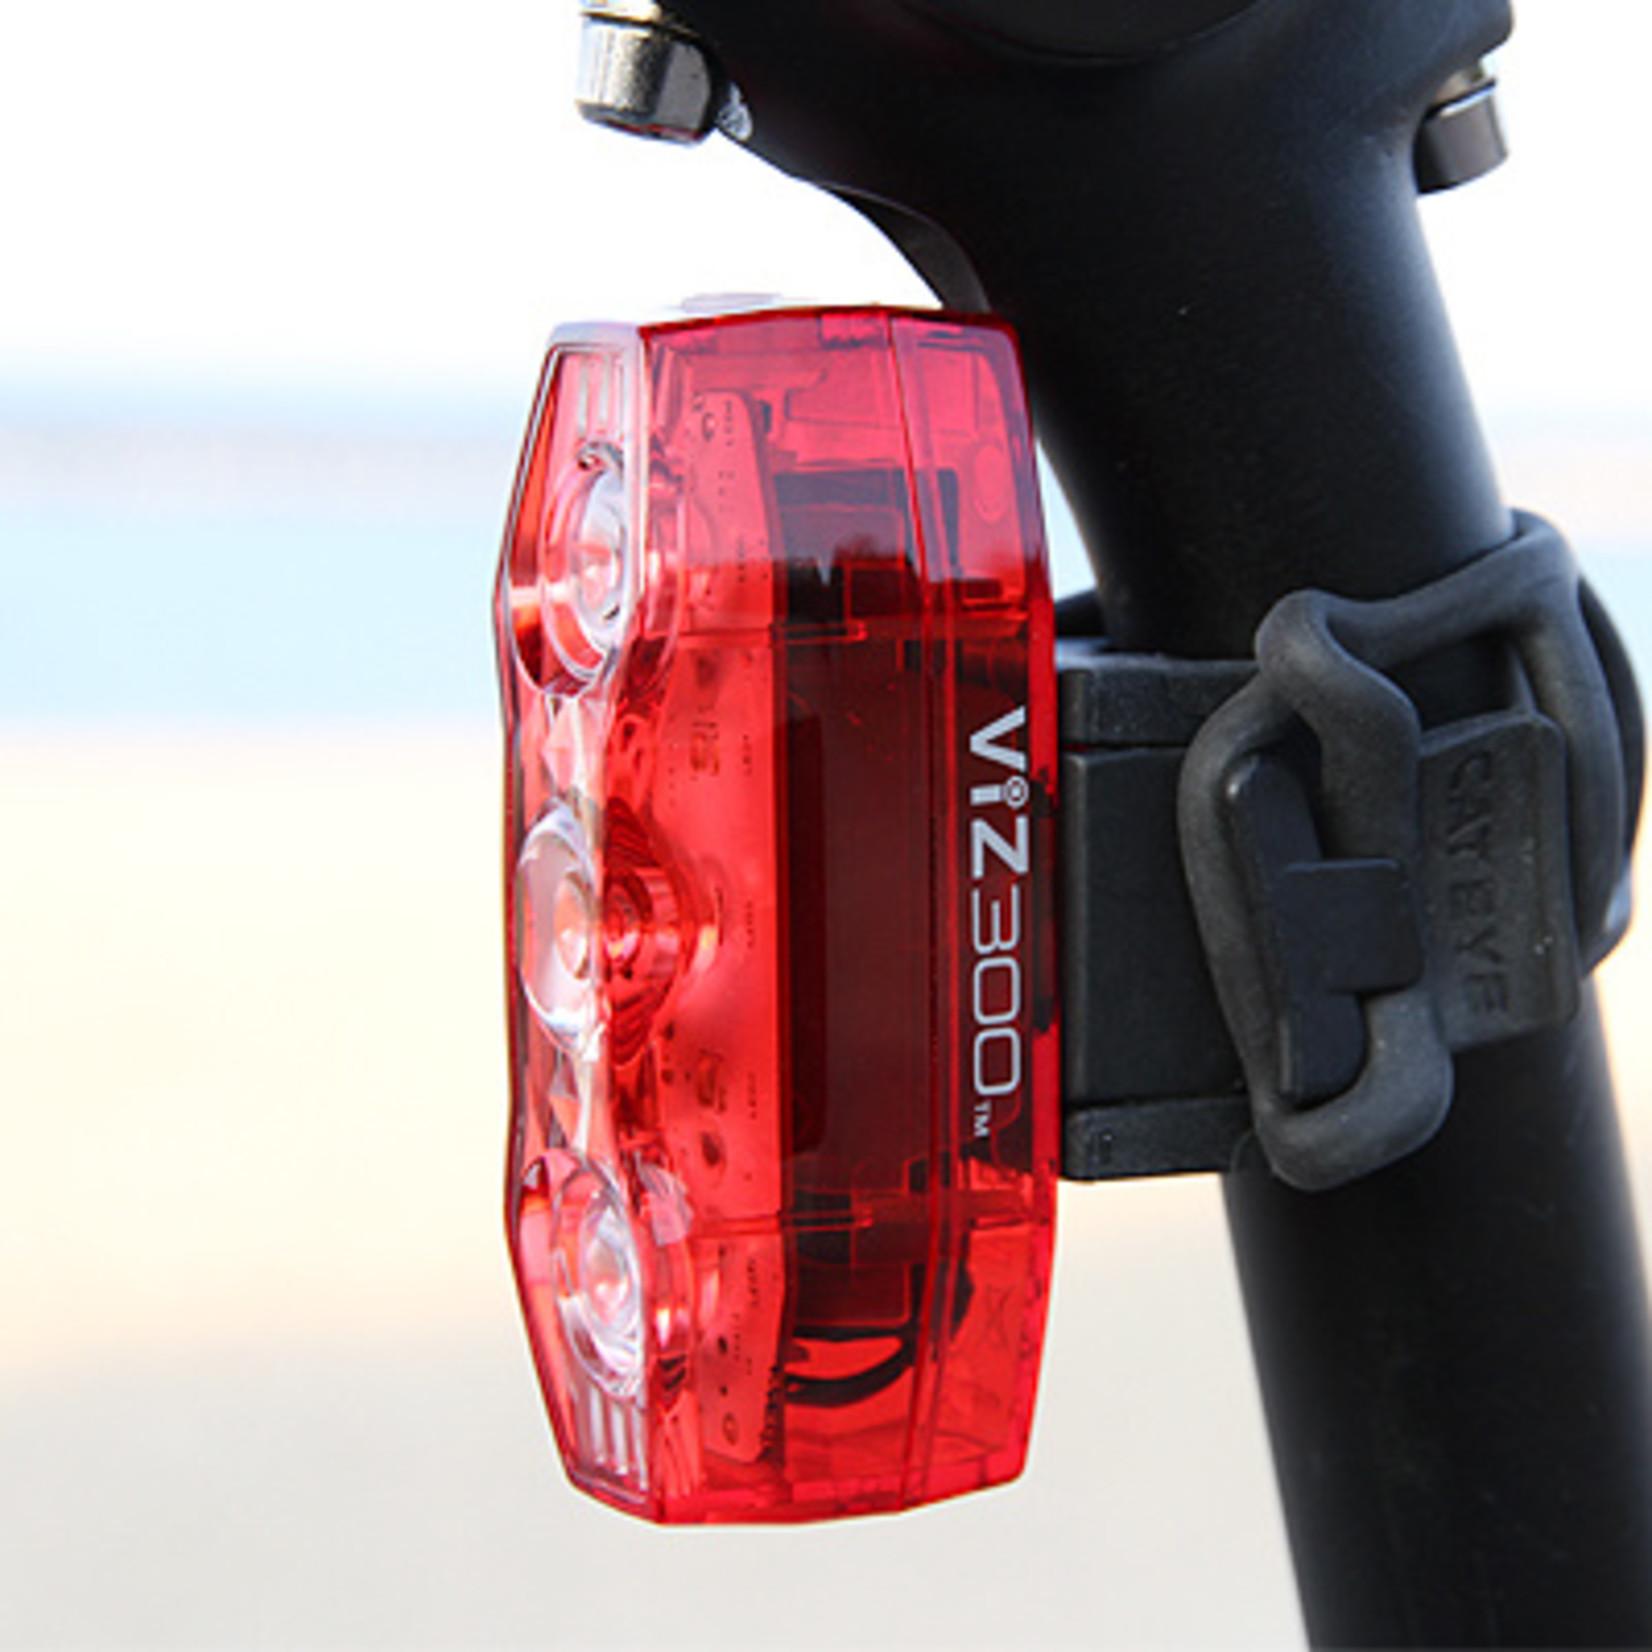 CATEYE VIZ 300 REAR LIGHT